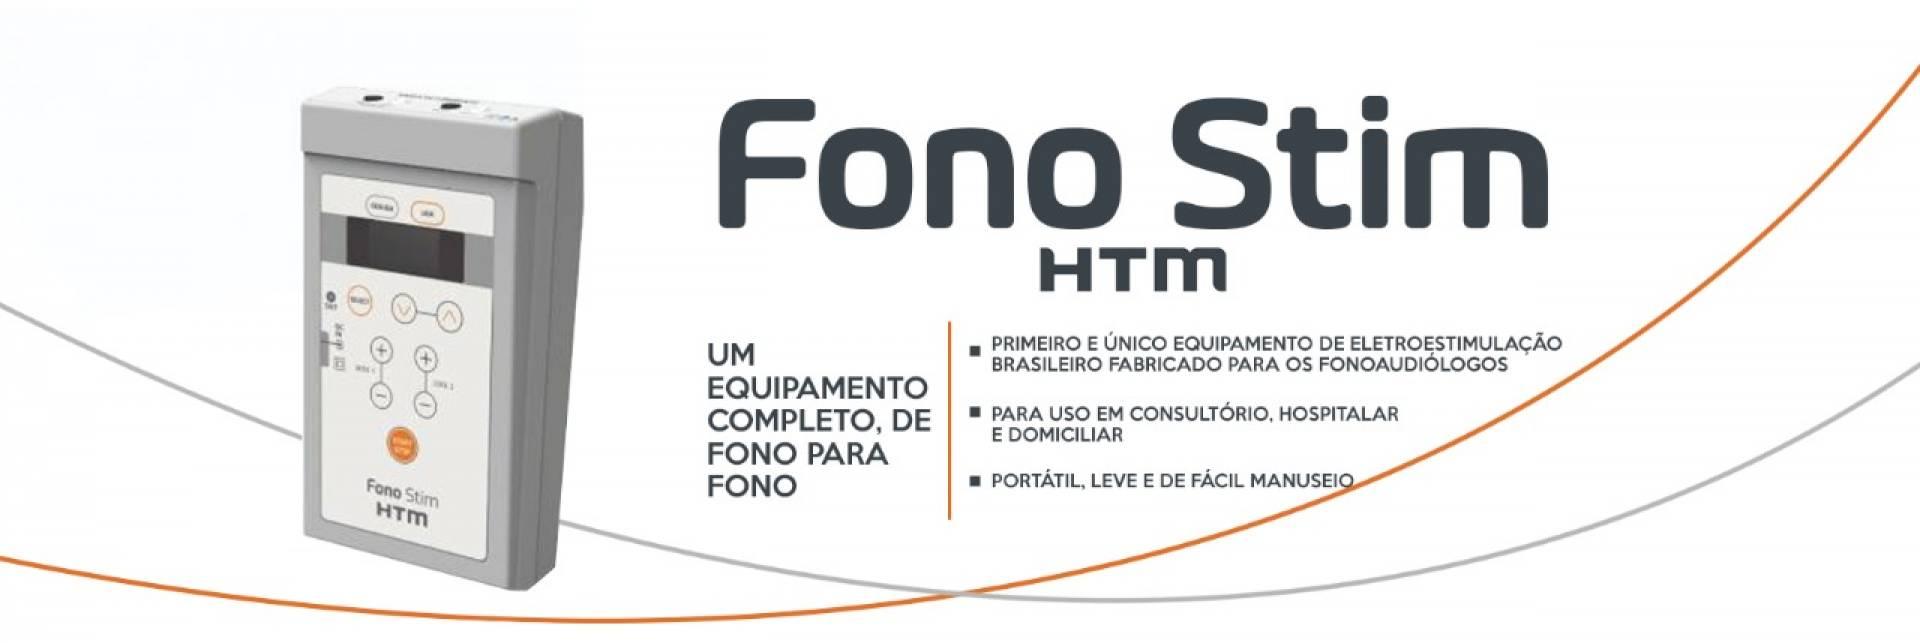 banner fono stim site 1